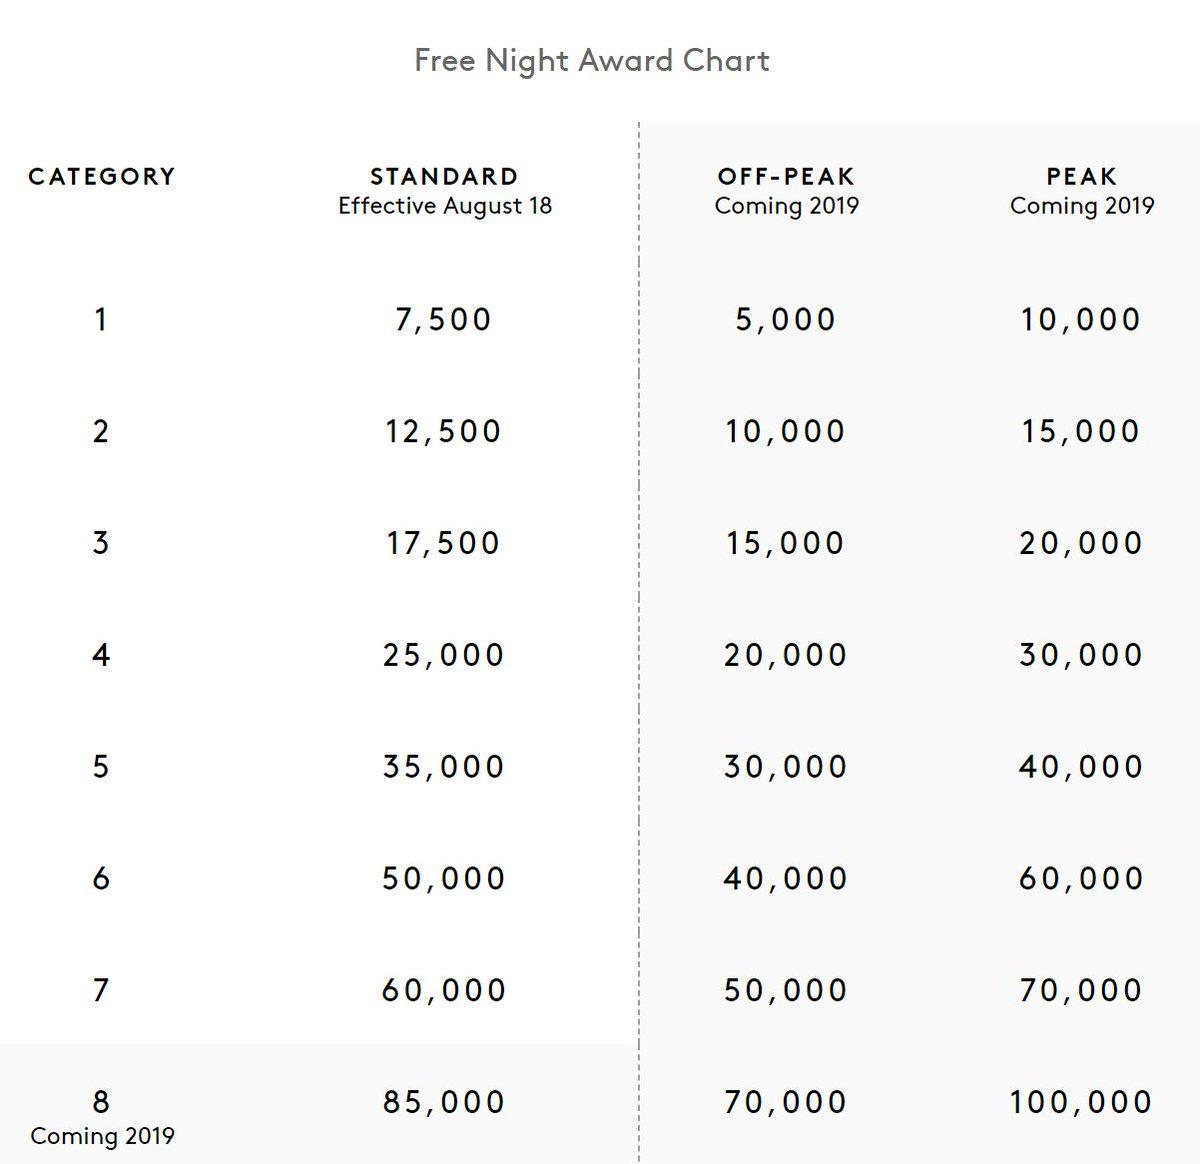 Boardingarea On Twitter Marriott Rewards 58 Category 6 Hotels Dropped To 50 000 Points Https T Co Ctgngks57v Via Loyaltytraveler